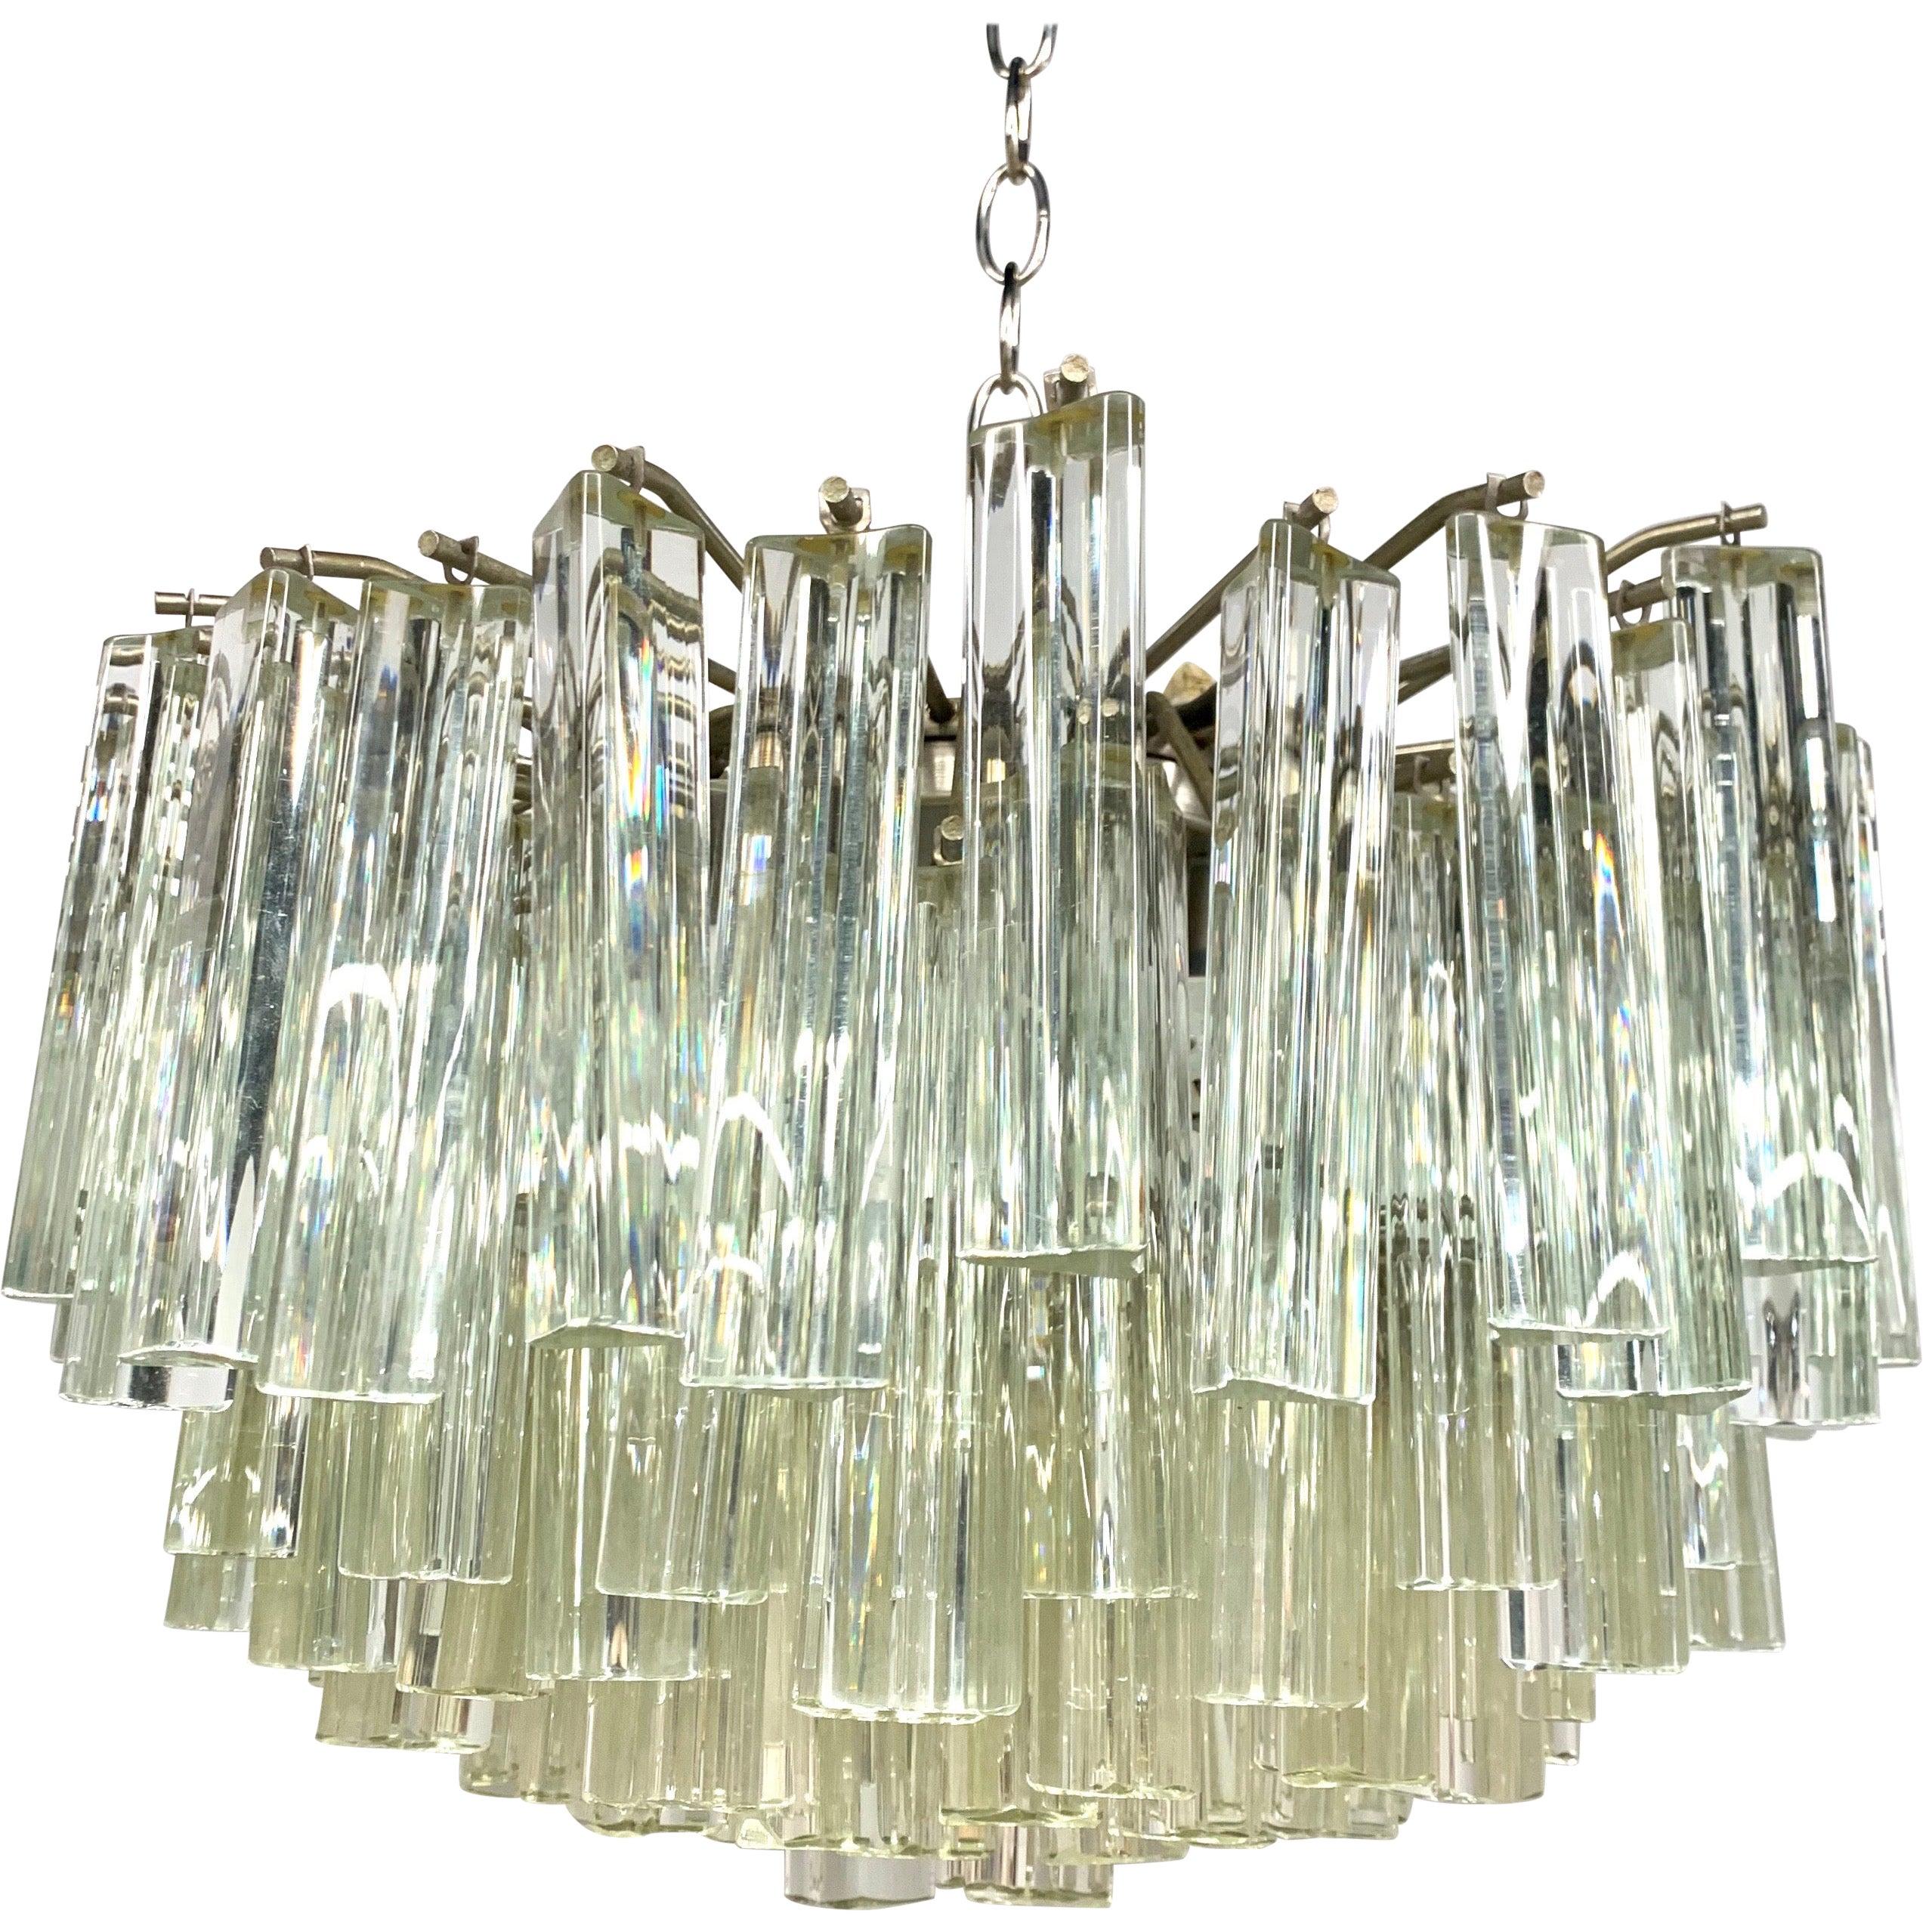 Camer Glass Midcentury Murano Glass Chandelier